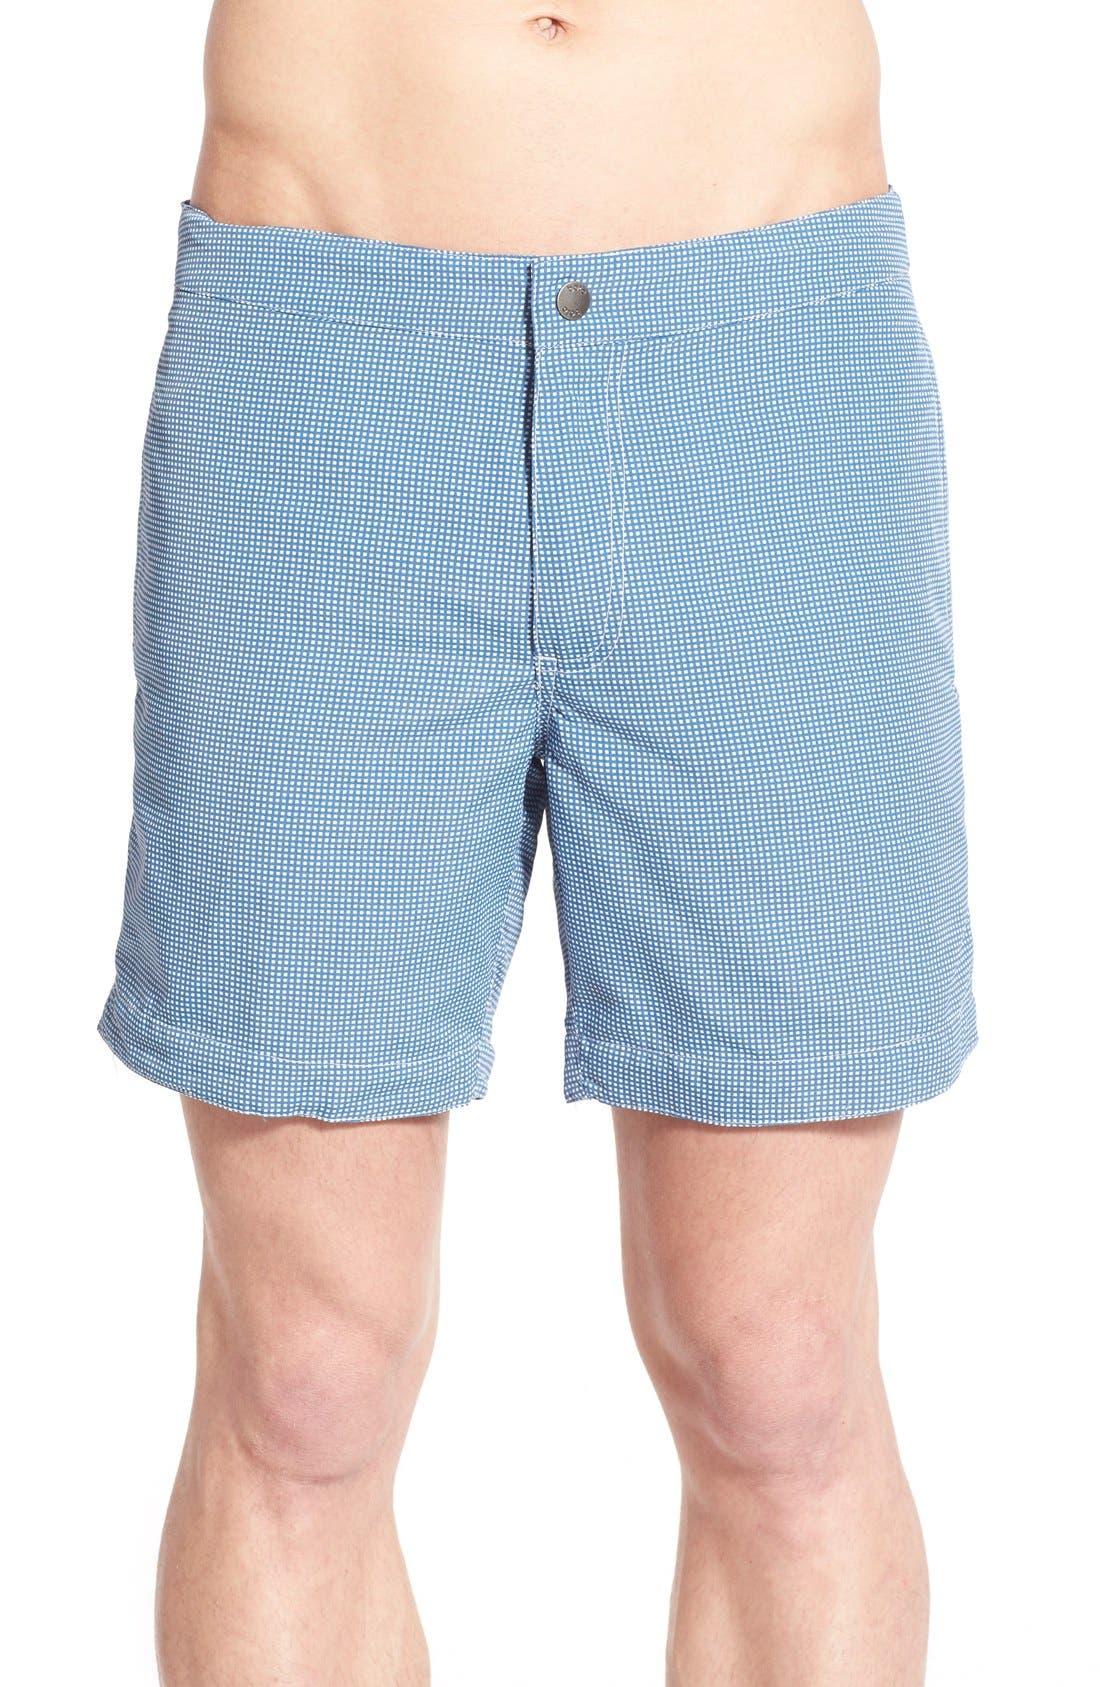 Aruba Tailored Fit Microcheck Swim Trunks,                         Main,                         color, 410